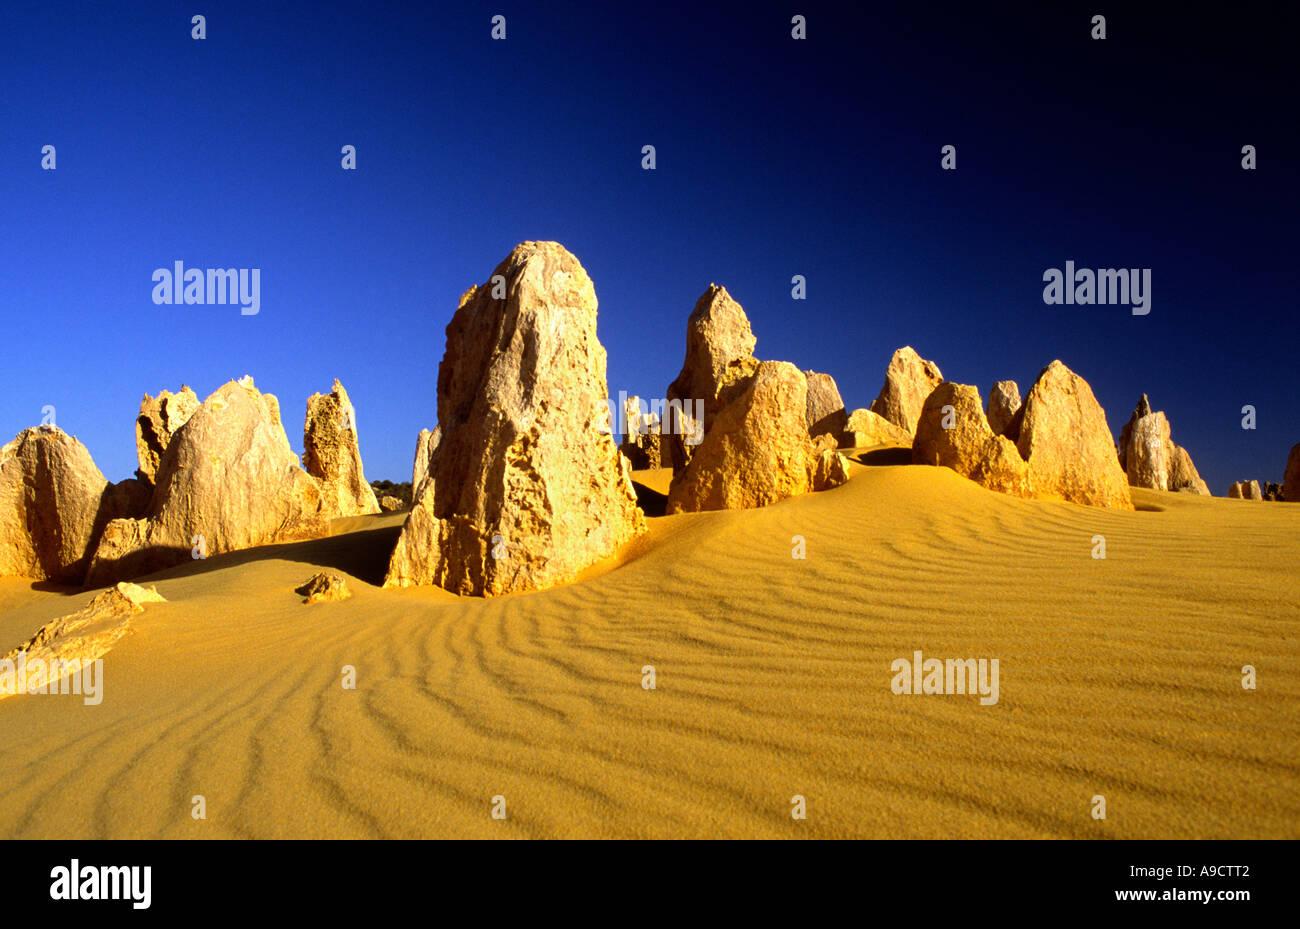 The Pinnacles Desert  Nambung National Park Western Australia - Stock Image